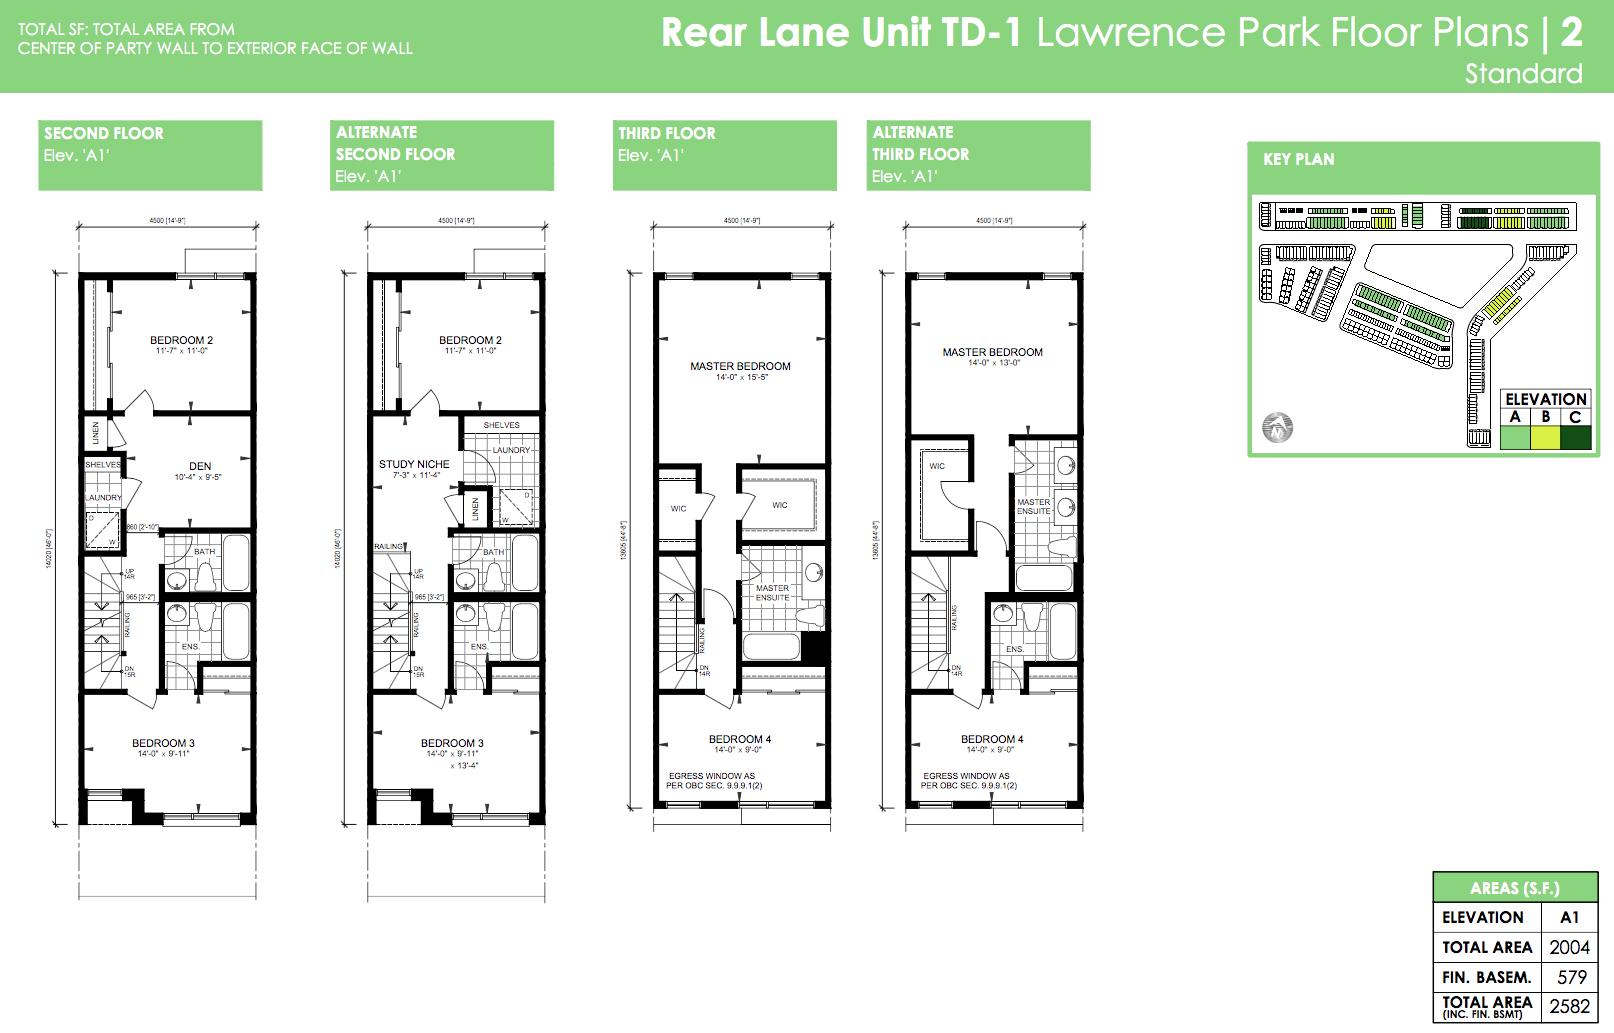 Rear Lane Unit TD-1 Lawrence Park Floor Plans 2 Standard